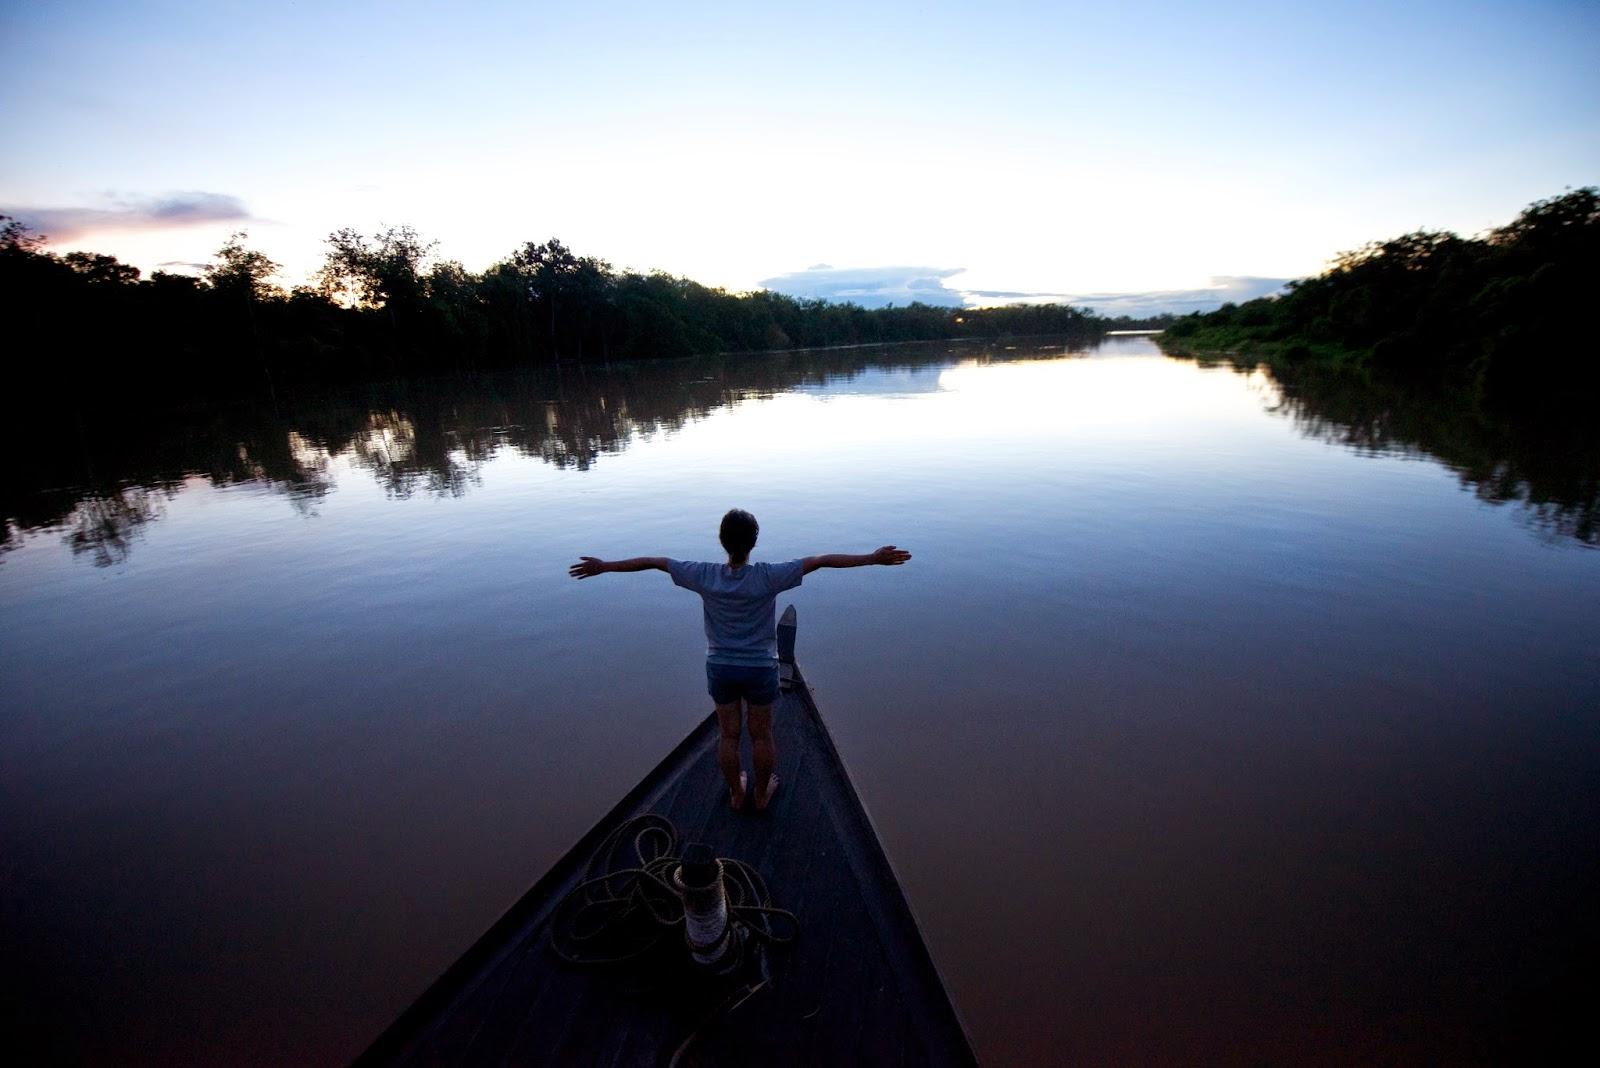 5-tujuan-wisata-kalimantan-yang-paling-diminati